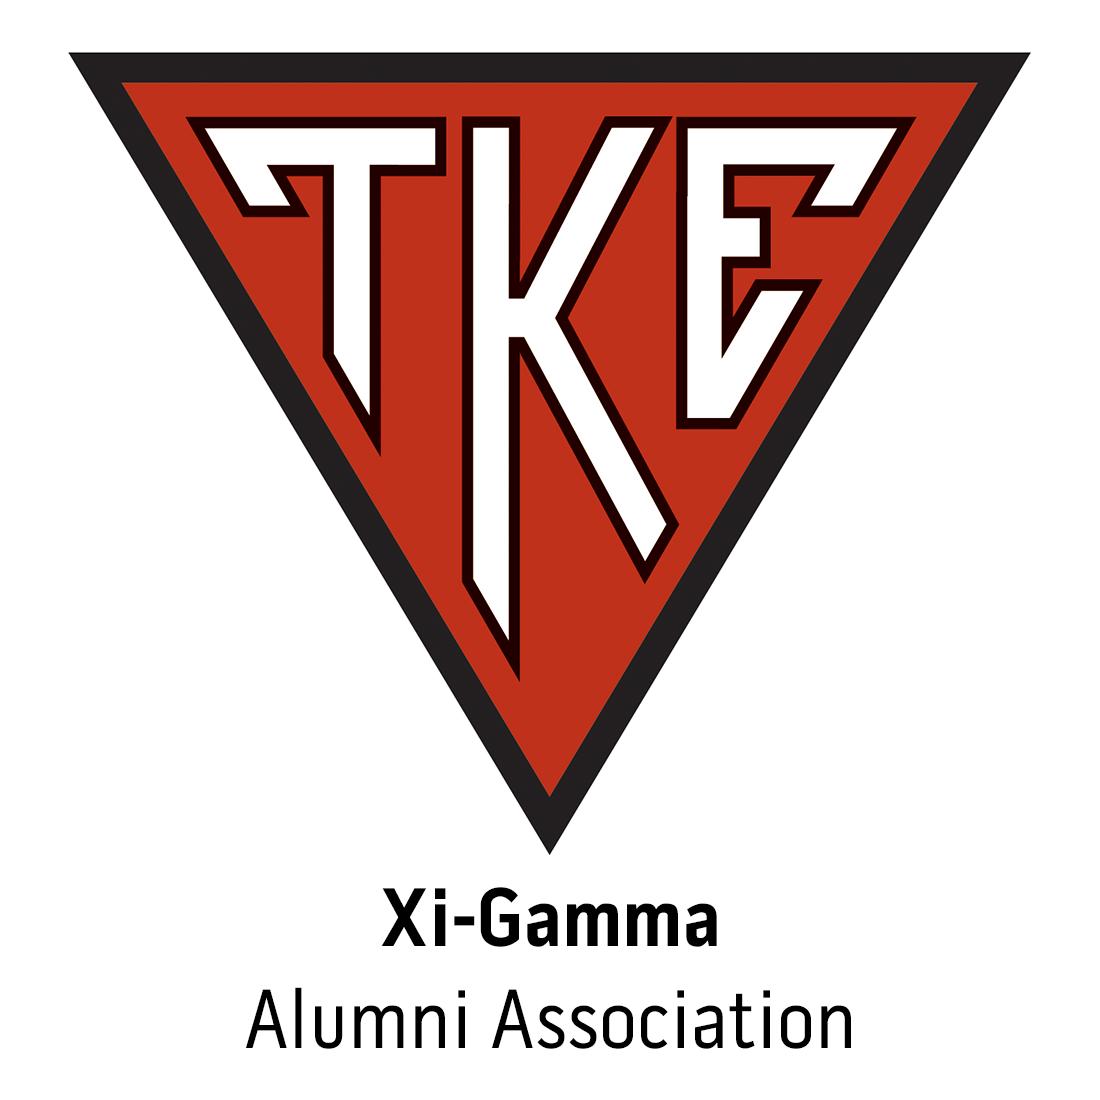 Xi-Gamma Alumni Association at New York Institute of New York-Old Westbury